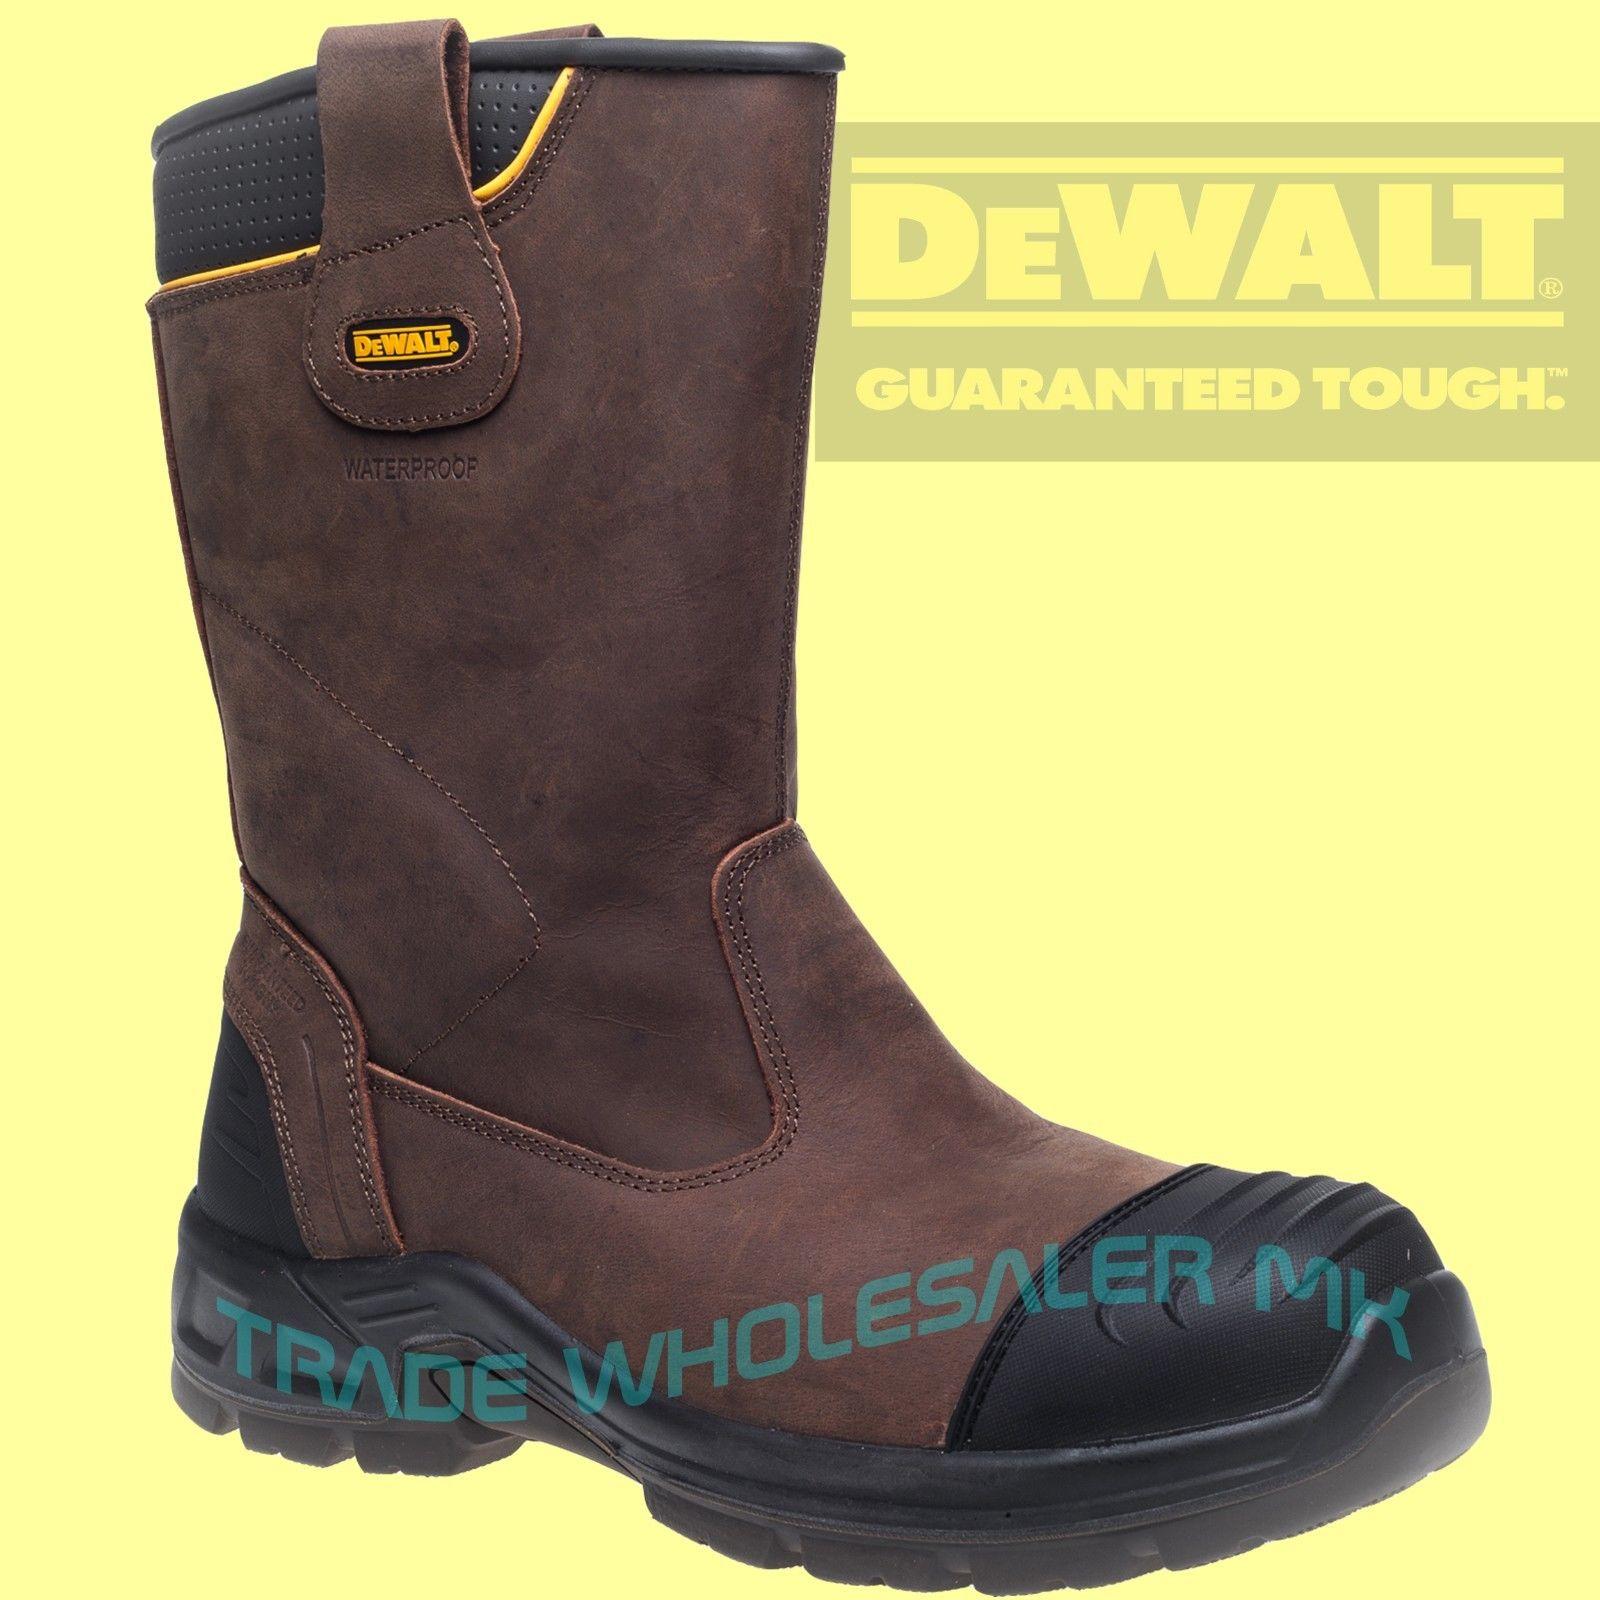 DeWalt Safety Boots Steel Toe